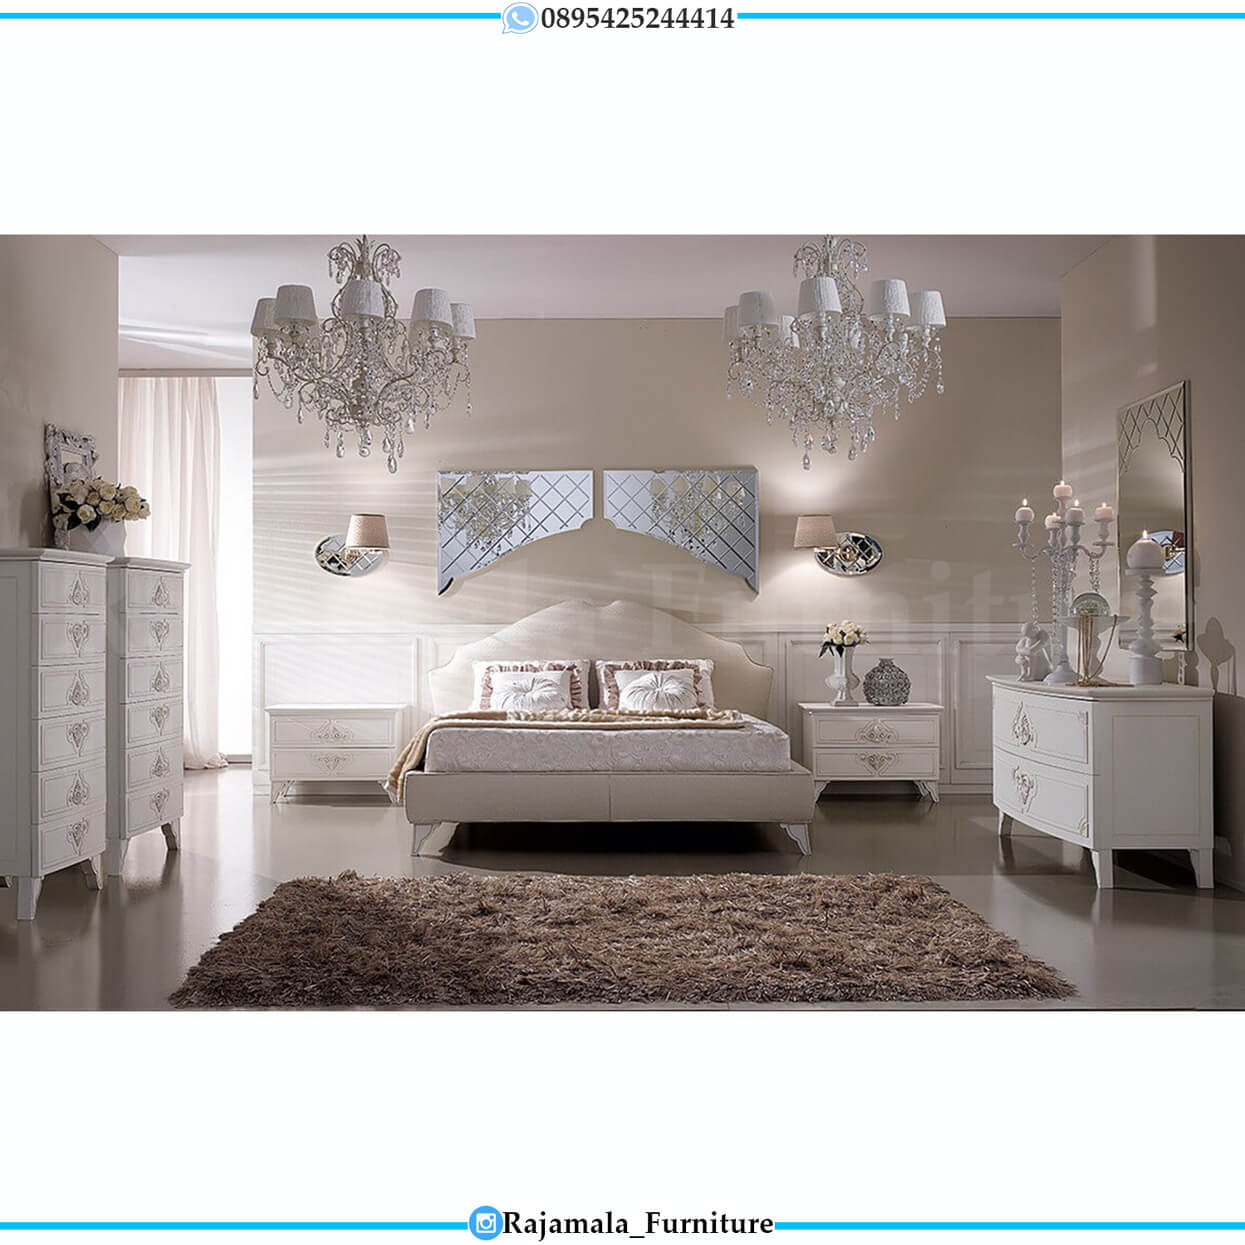 Kamar Set Minimalis Terbaru Luxury Classic Design Jepara RM-0222